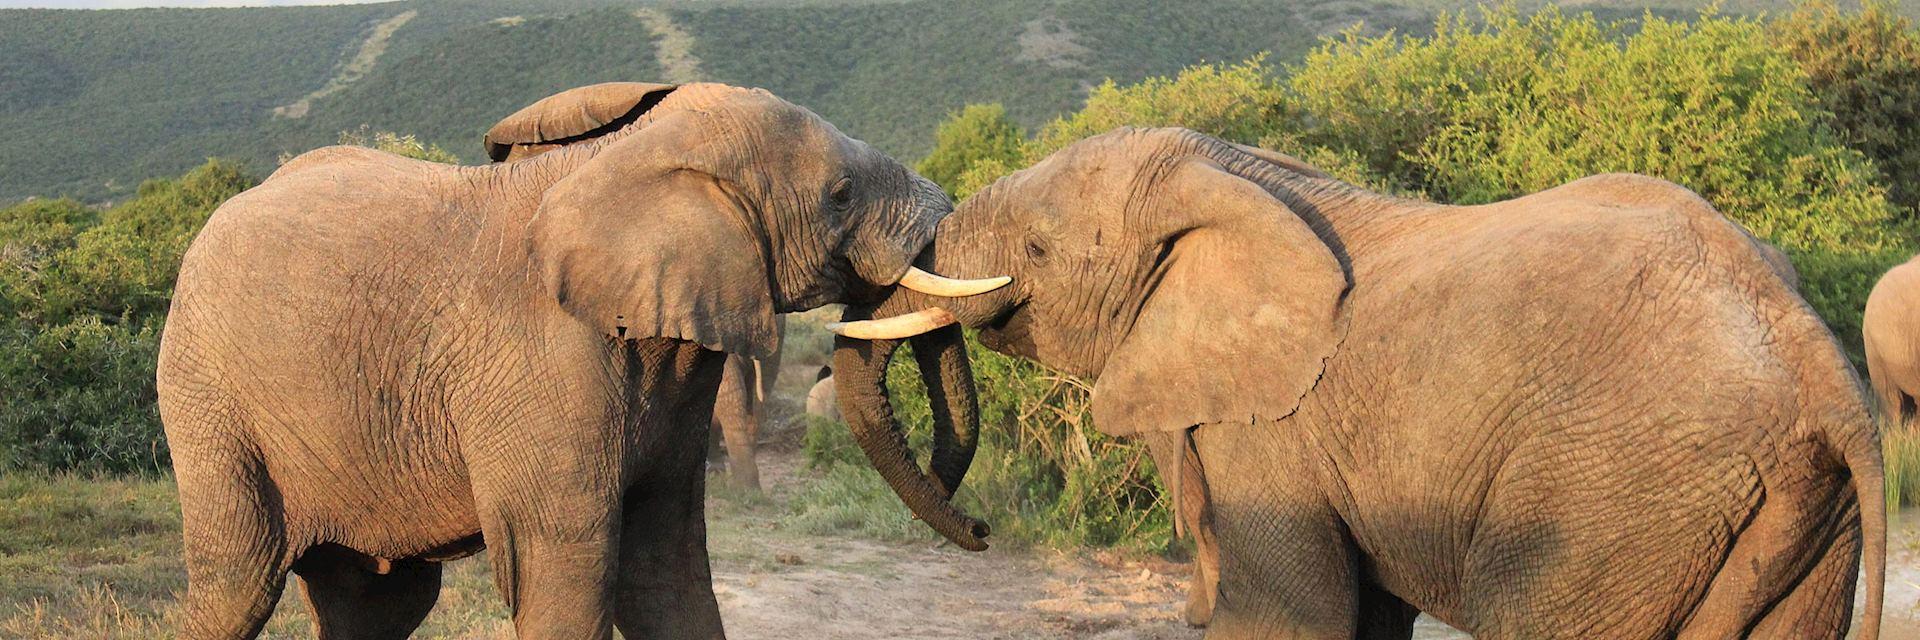 Elephants in Shamwari Private Game Reserve